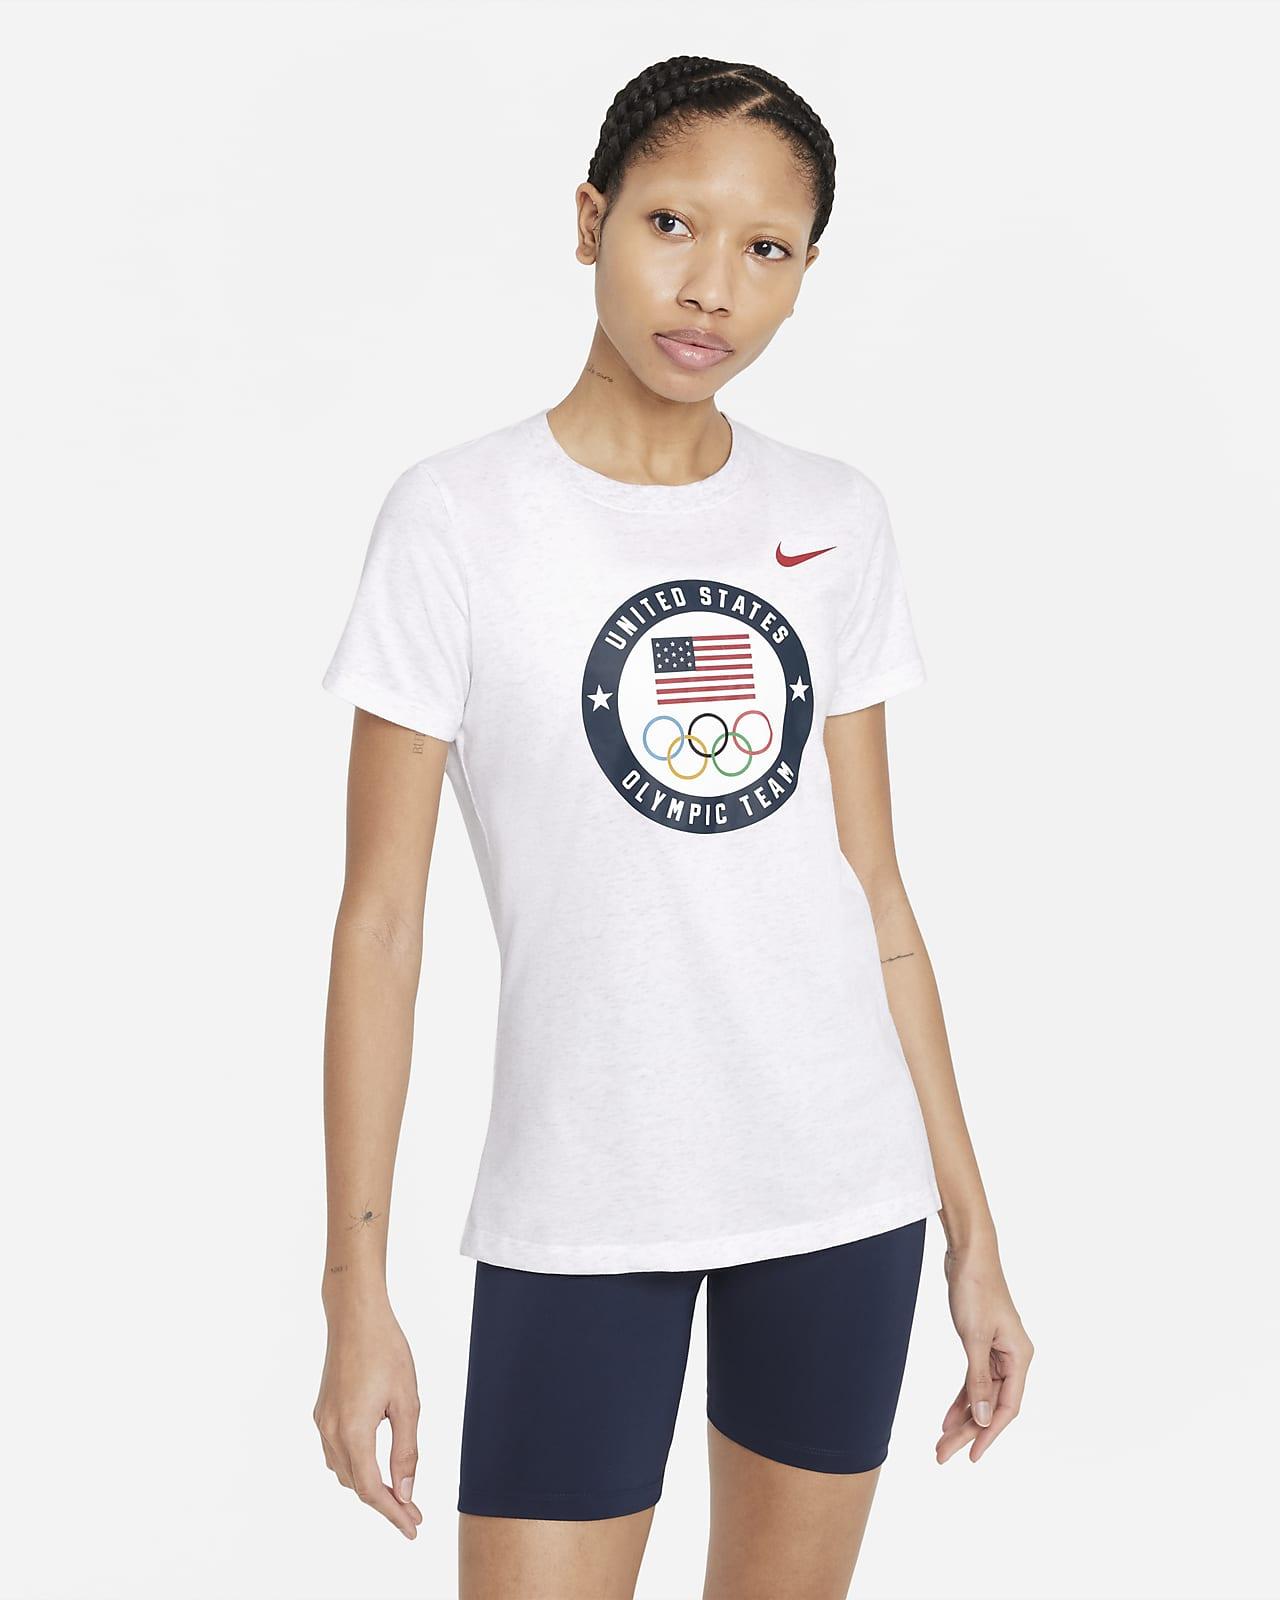 Nike Dri-FIT Team USA Women's Training T-Shirt